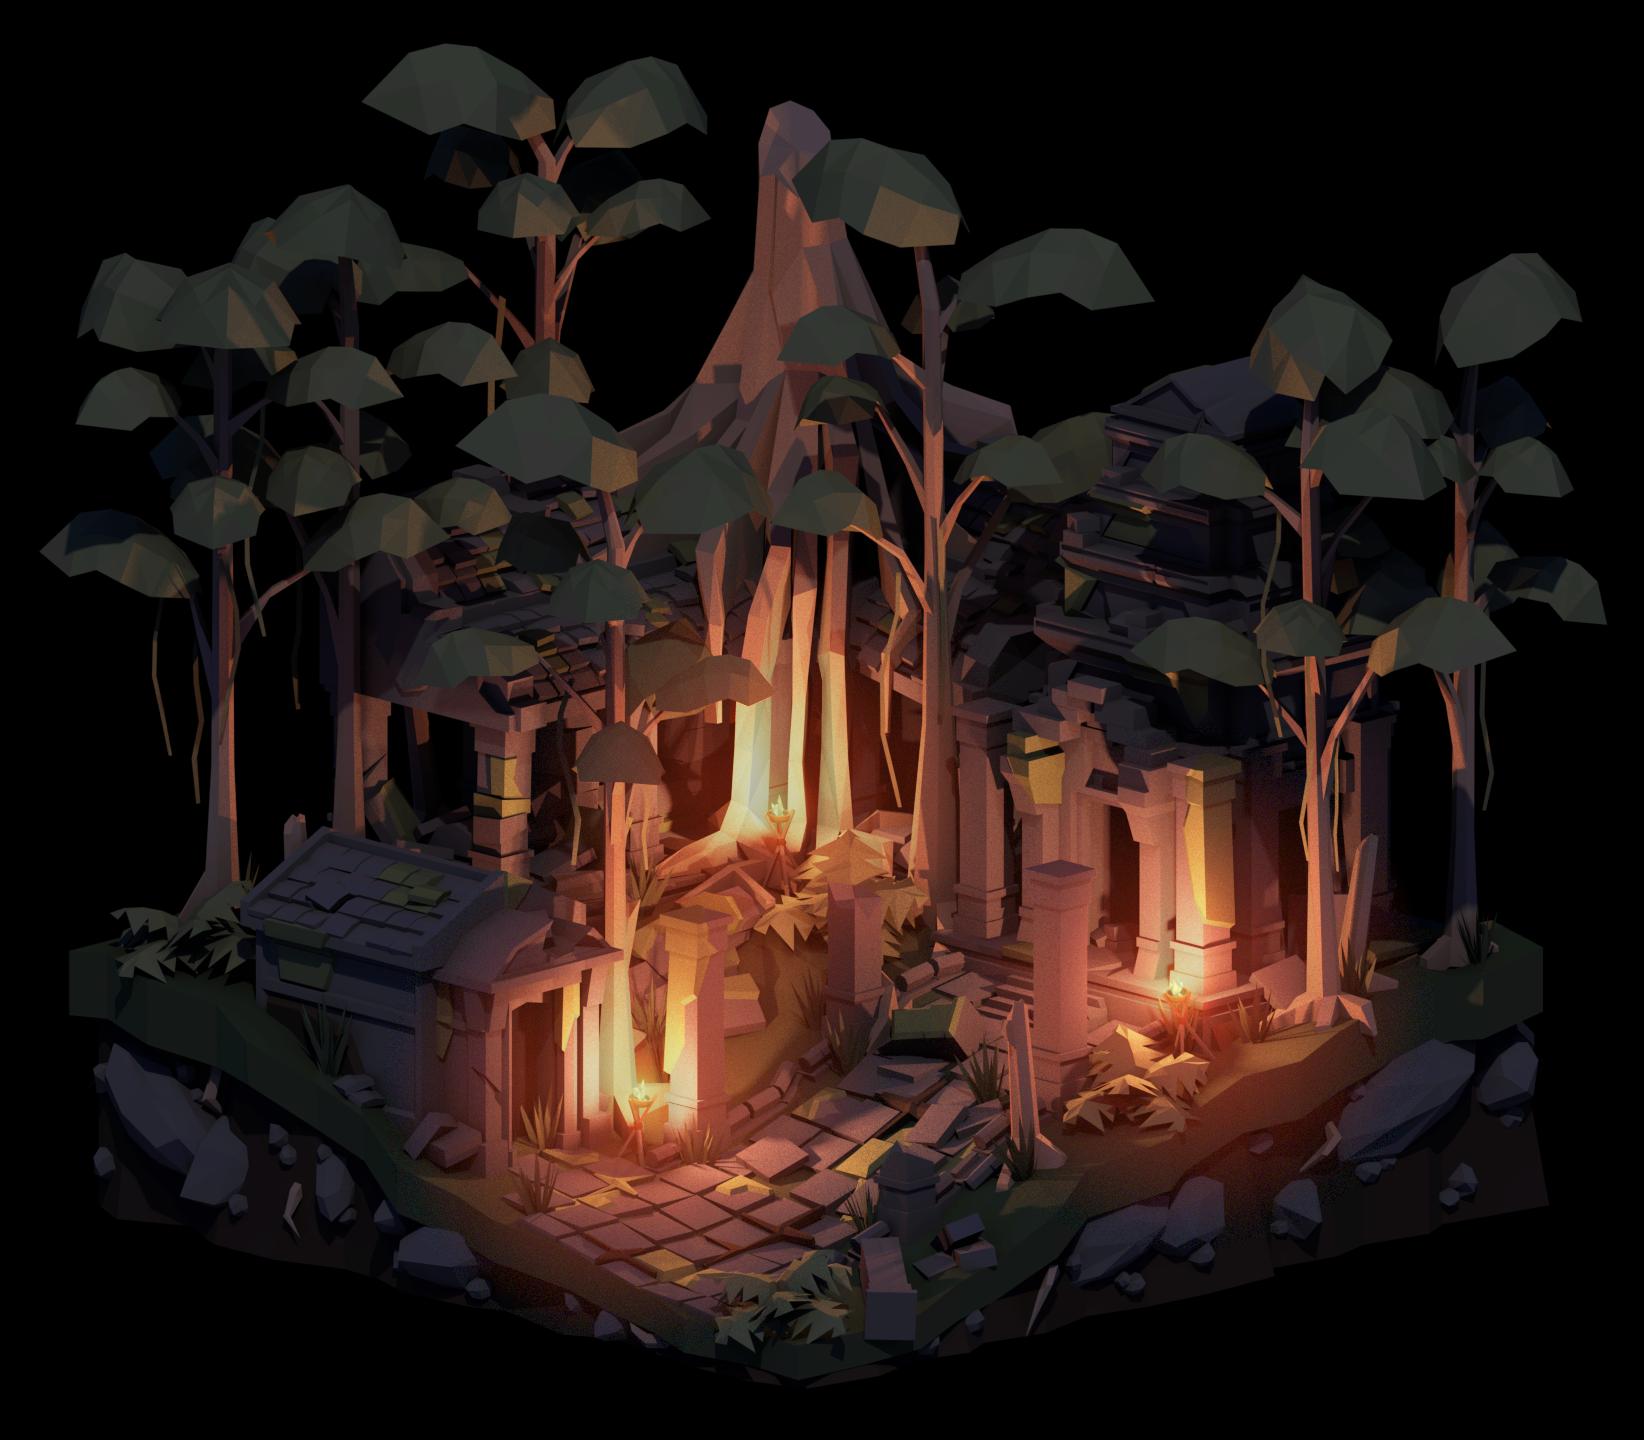 Week 13 - Jungle Temple